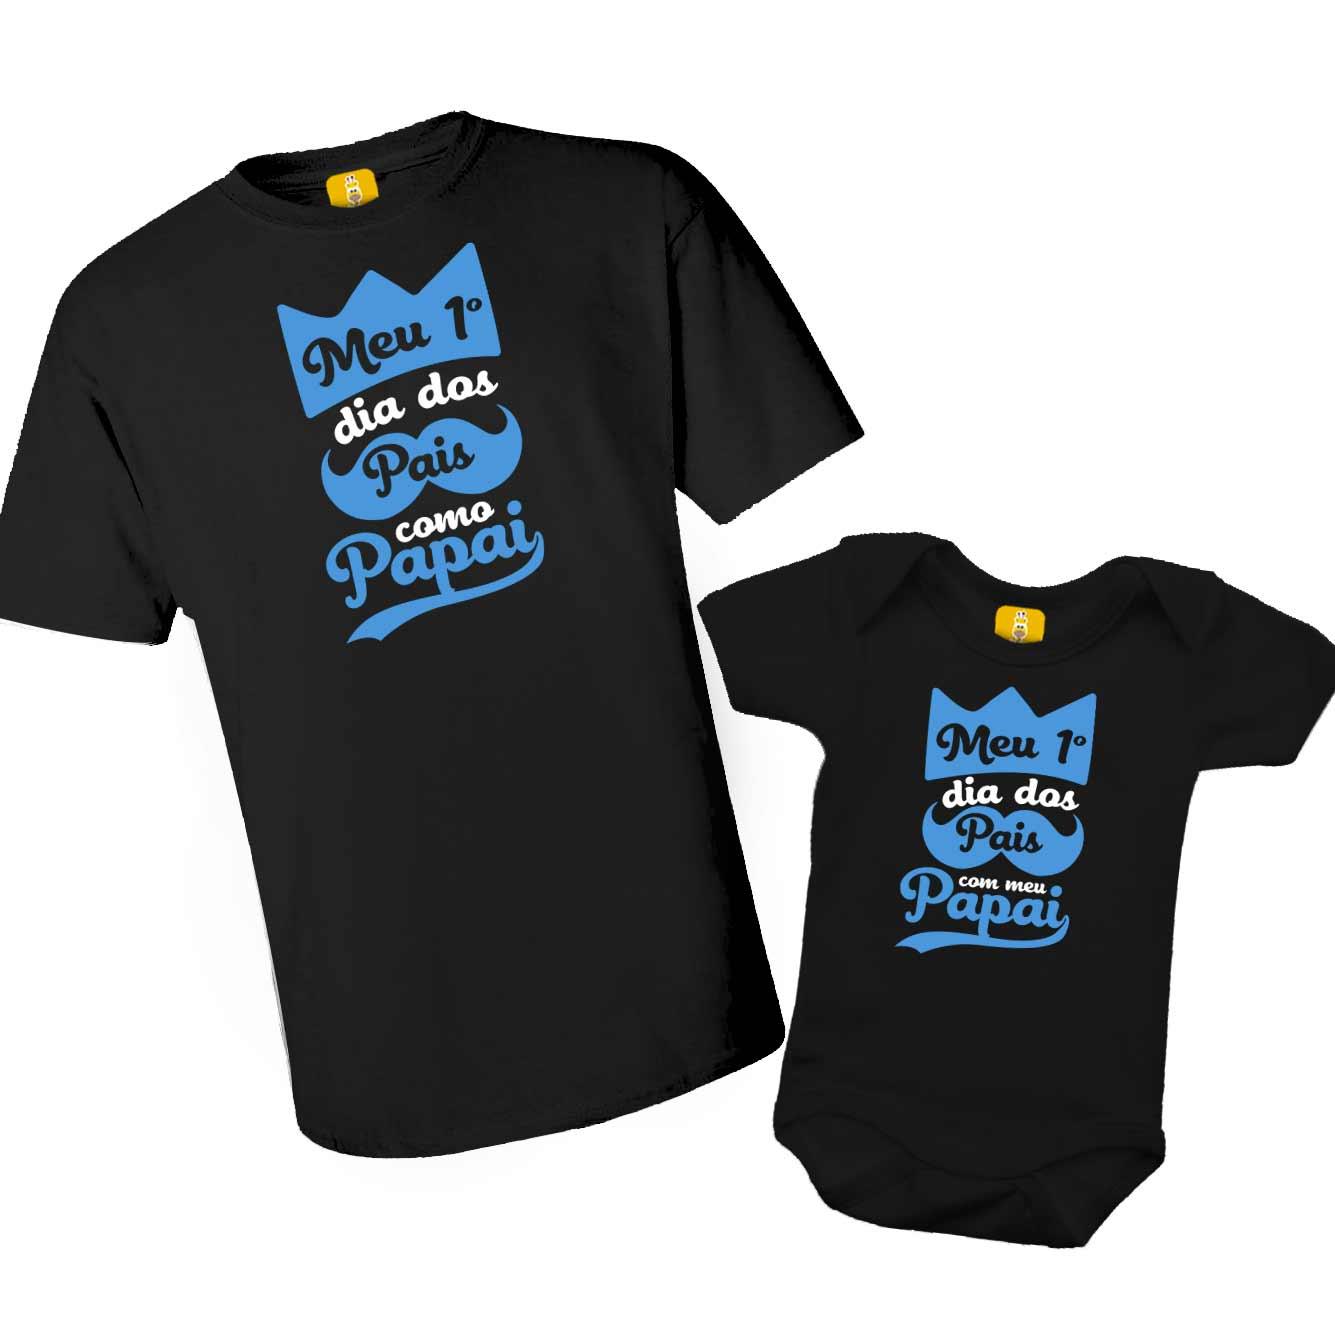 Kit camiseta e body - Meu primeiro dia dos pais Realeza